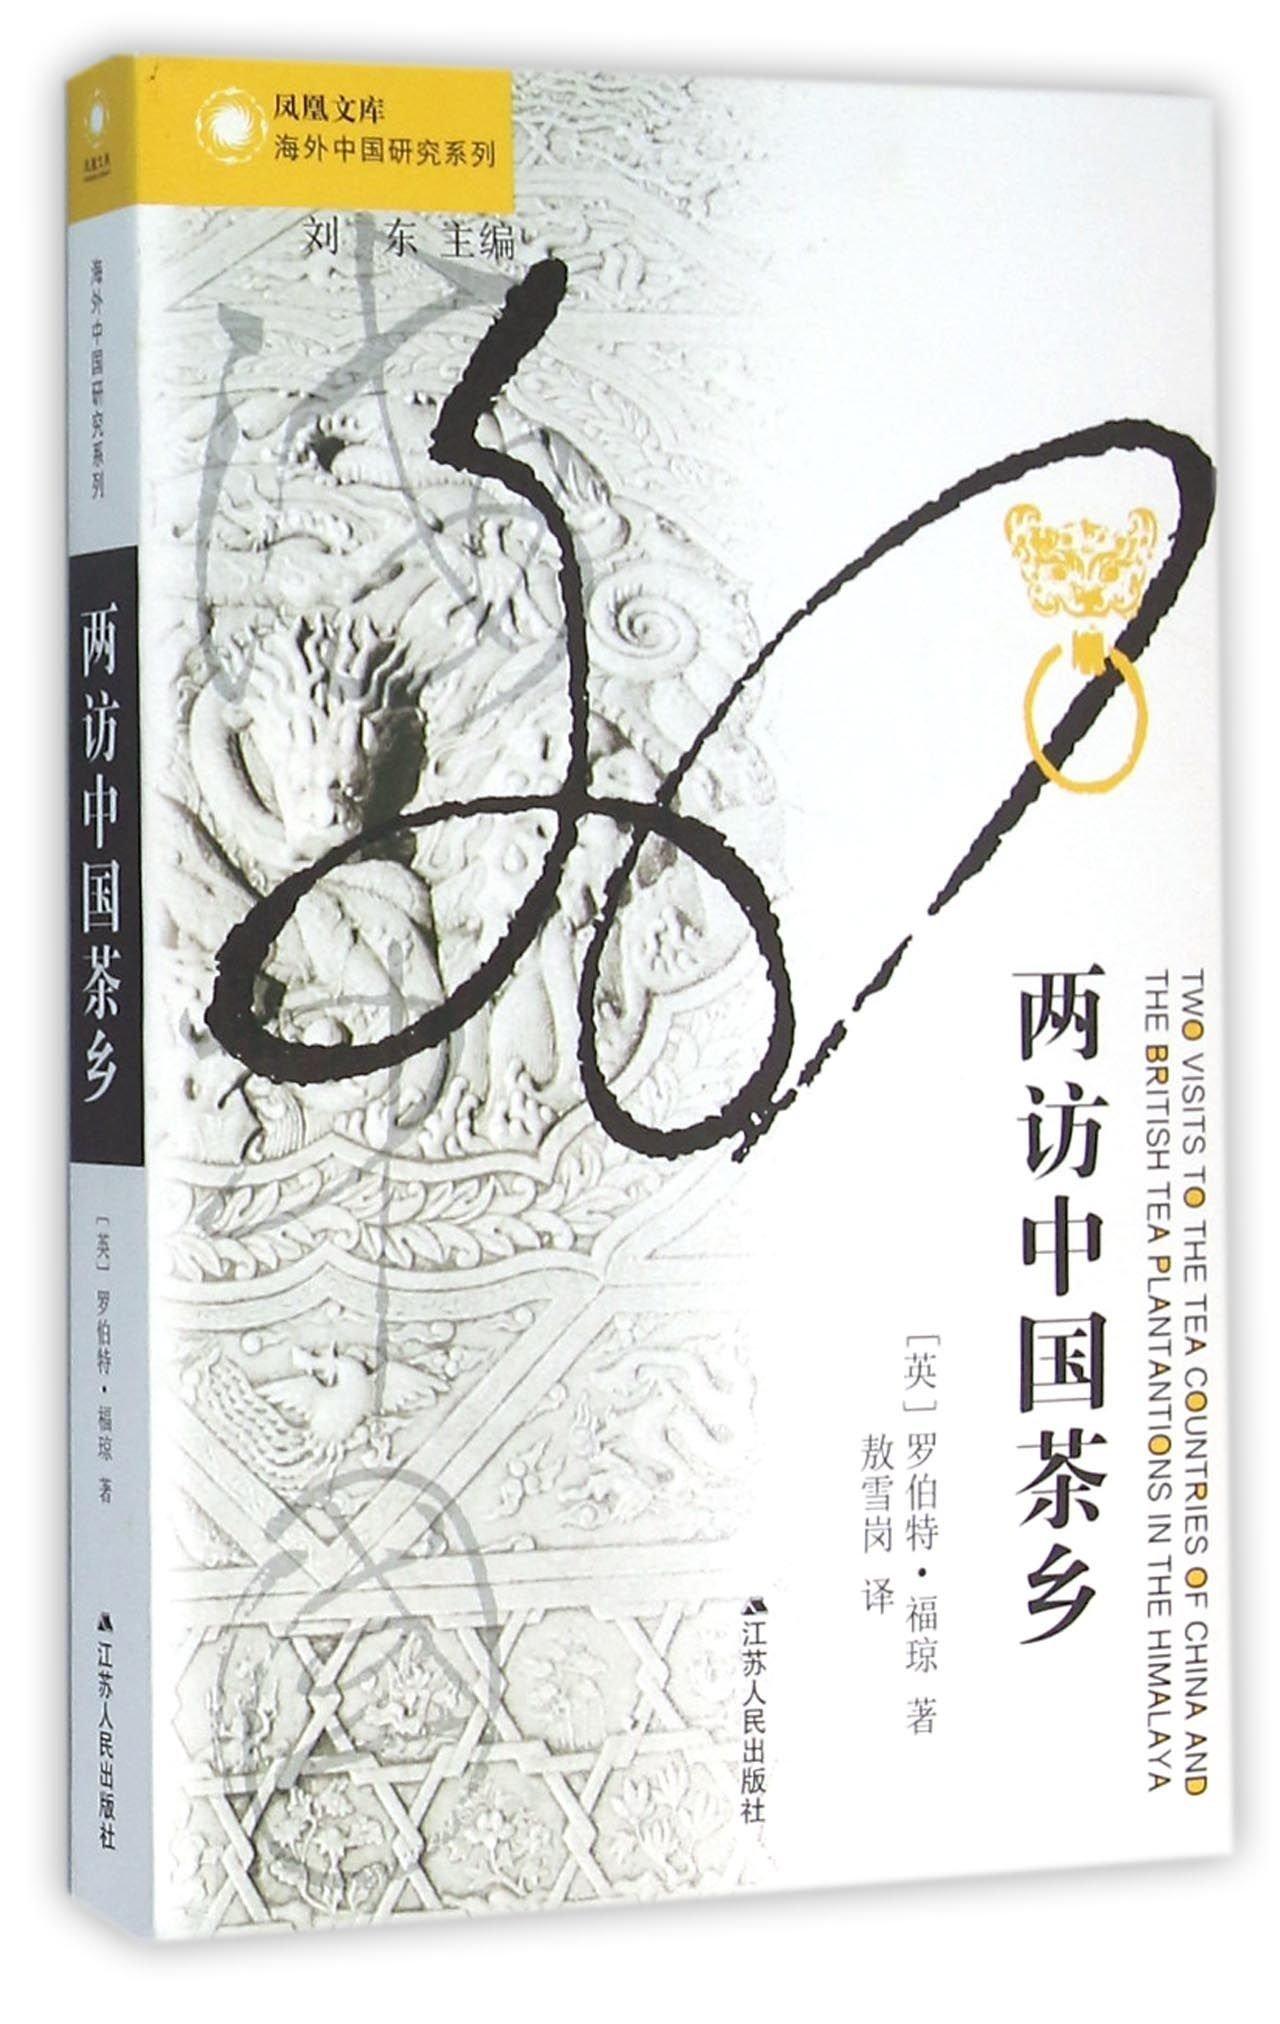 Download 两访中国茶乡/海外中国研究系列/凤凰文库 pdf epub